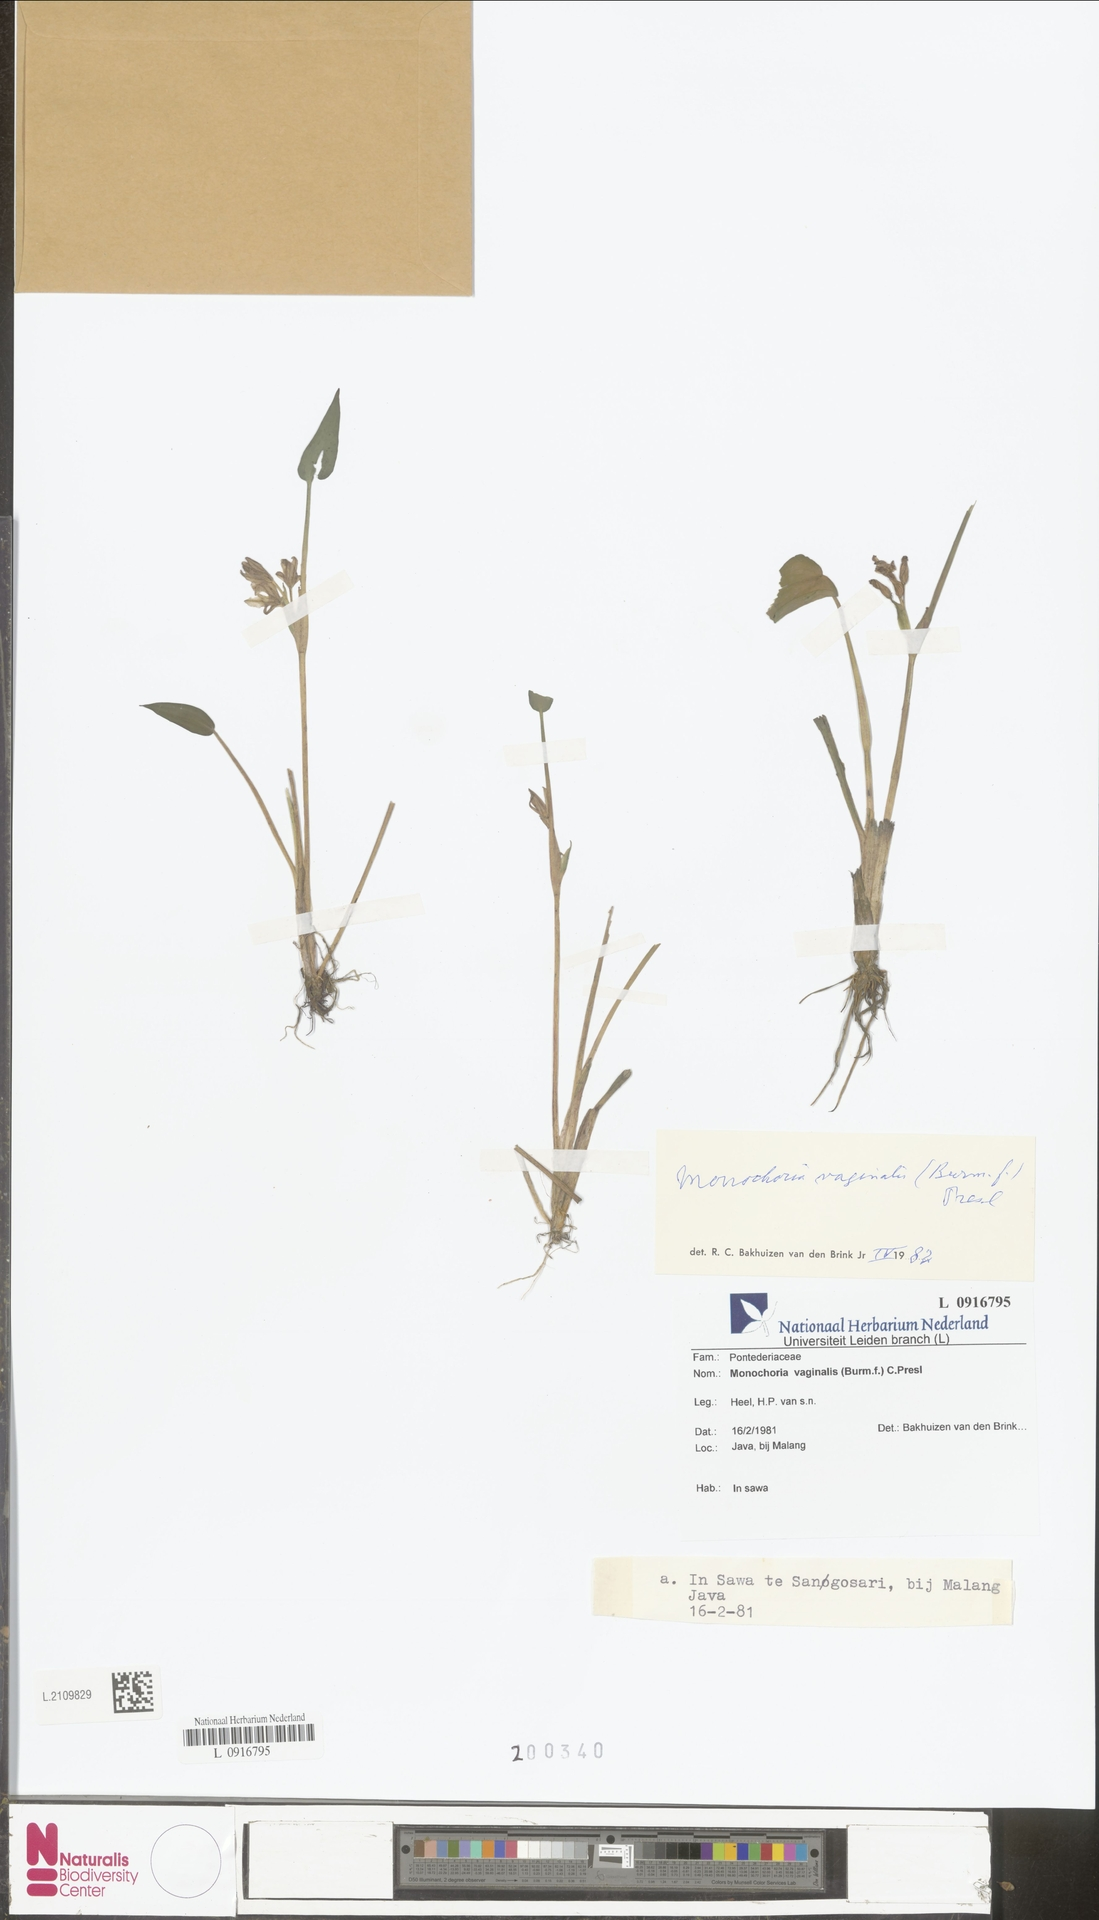 L.2109829 | Monochoria vaginalis (Burm.f.) Presley